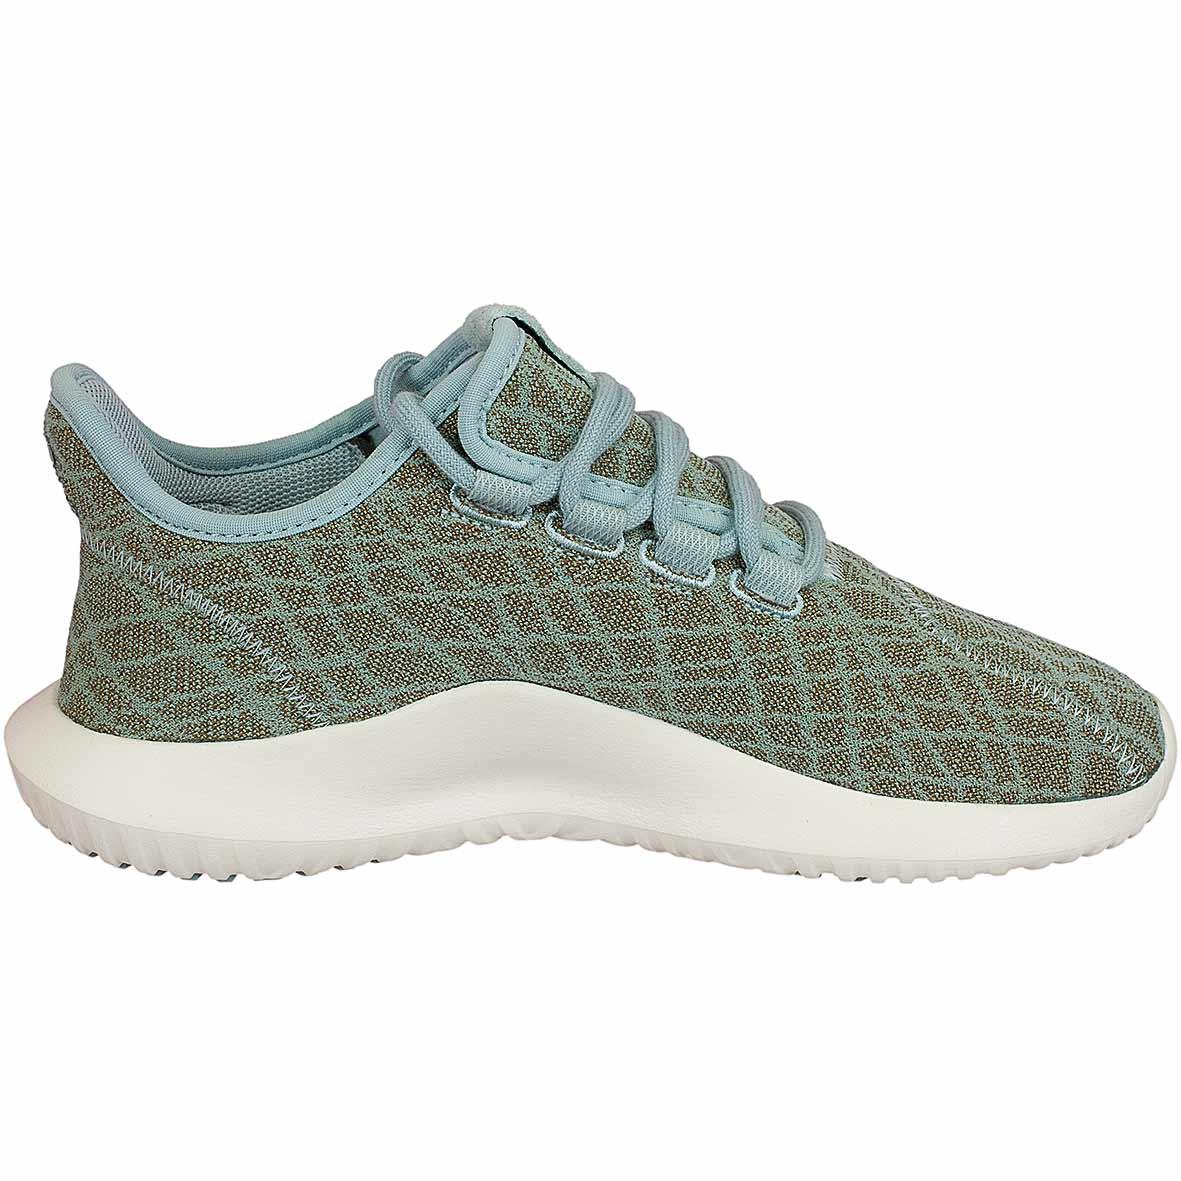 Adidas Originals Damen Turnschuhe Tubular Shadow grün hier Besteellen  Amoy